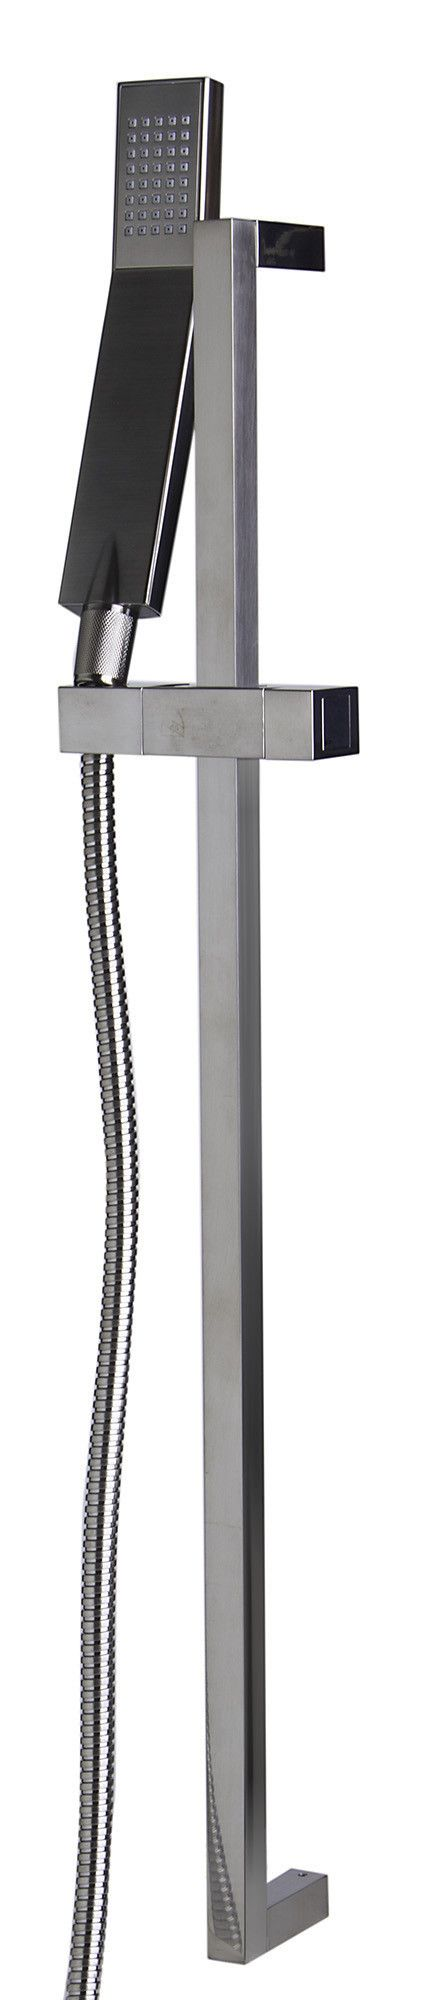 ALFI Brushed Nickel Sliding Rail Hand Held Shower Head Set with Hose